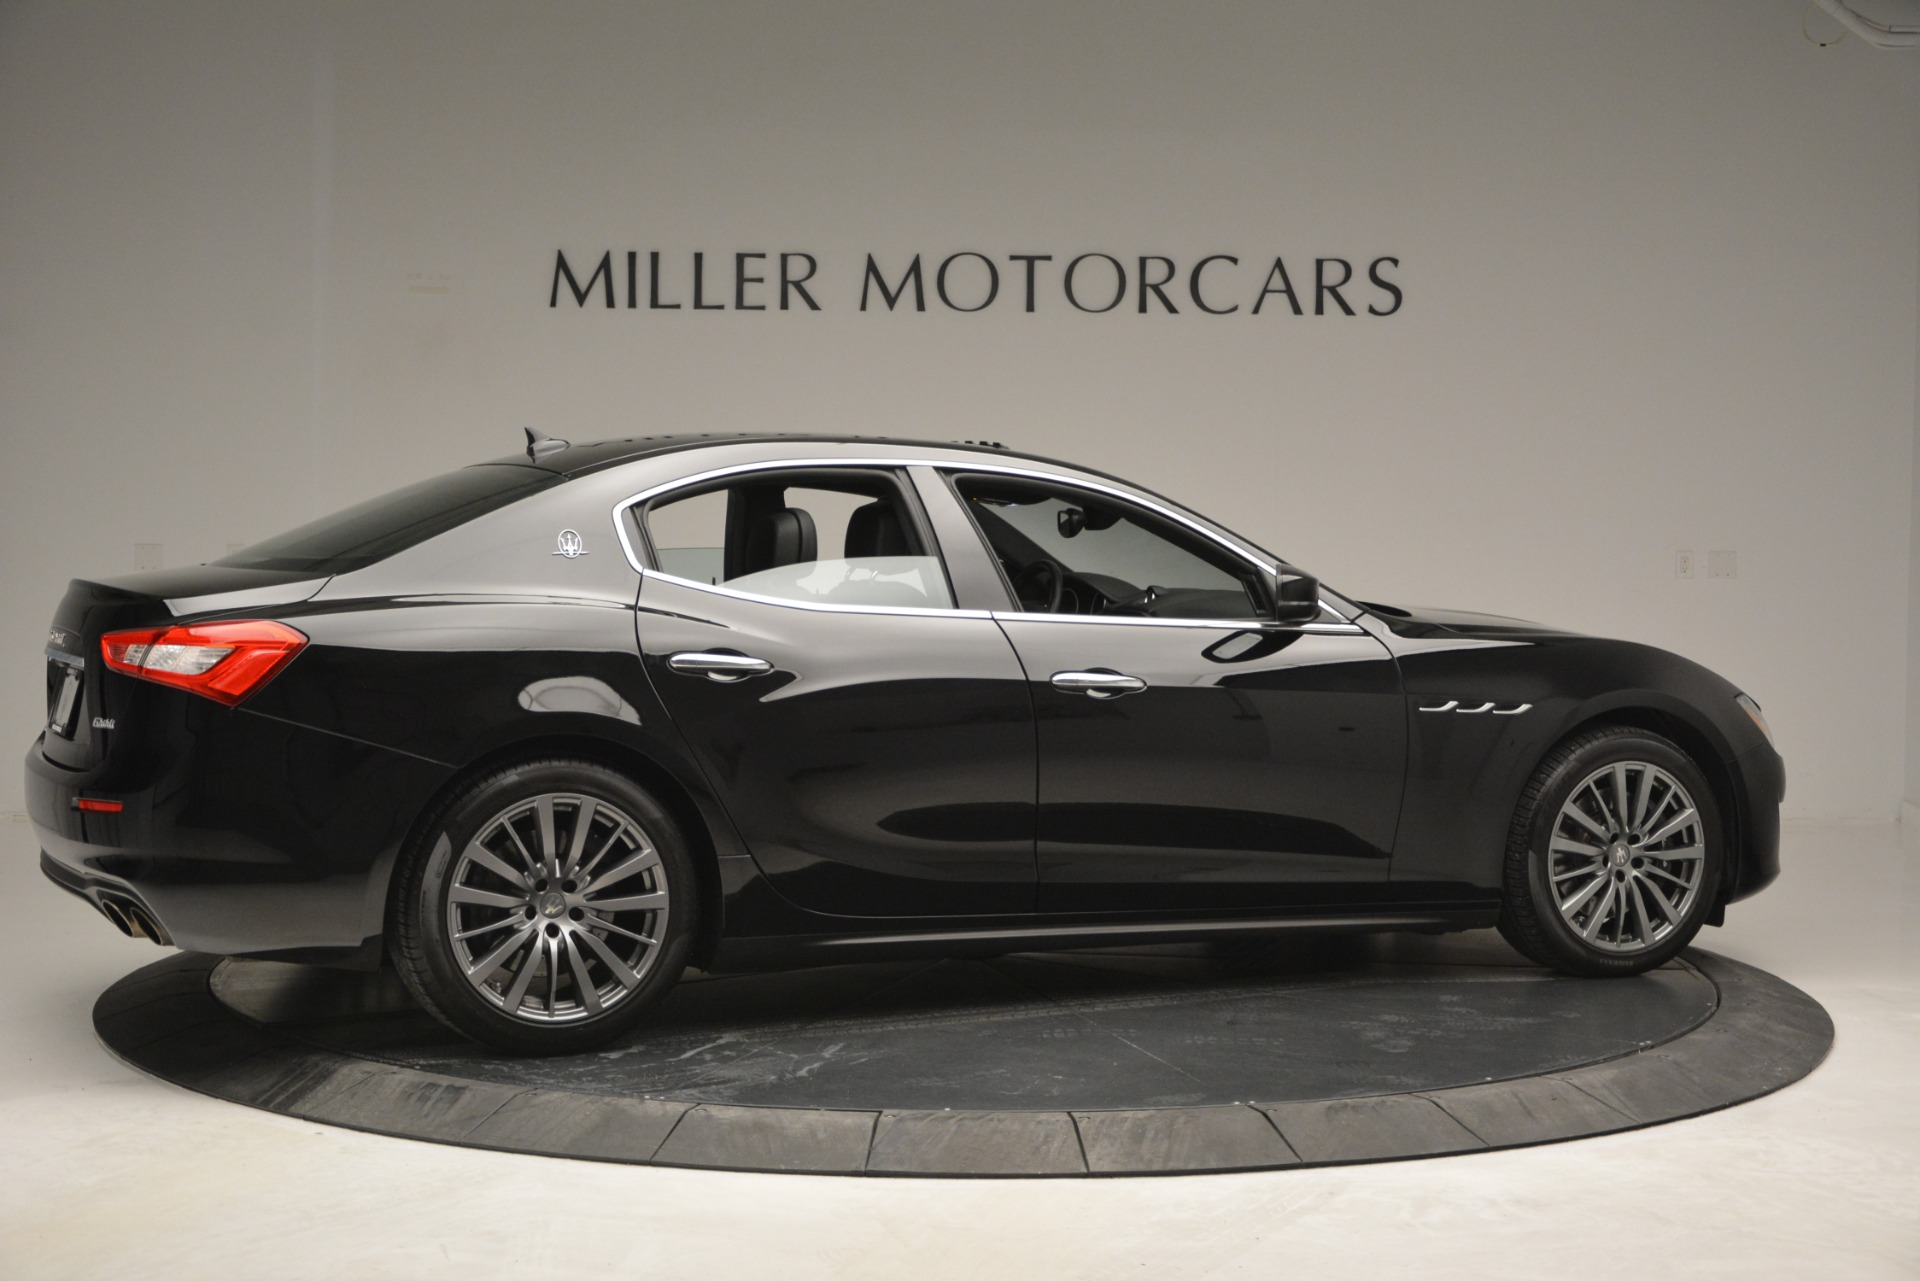 Used 2018 Maserati Ghibli S Q4 For Sale In Greenwich, CT. Alfa Romeo of Greenwich, 7481 2944_p11